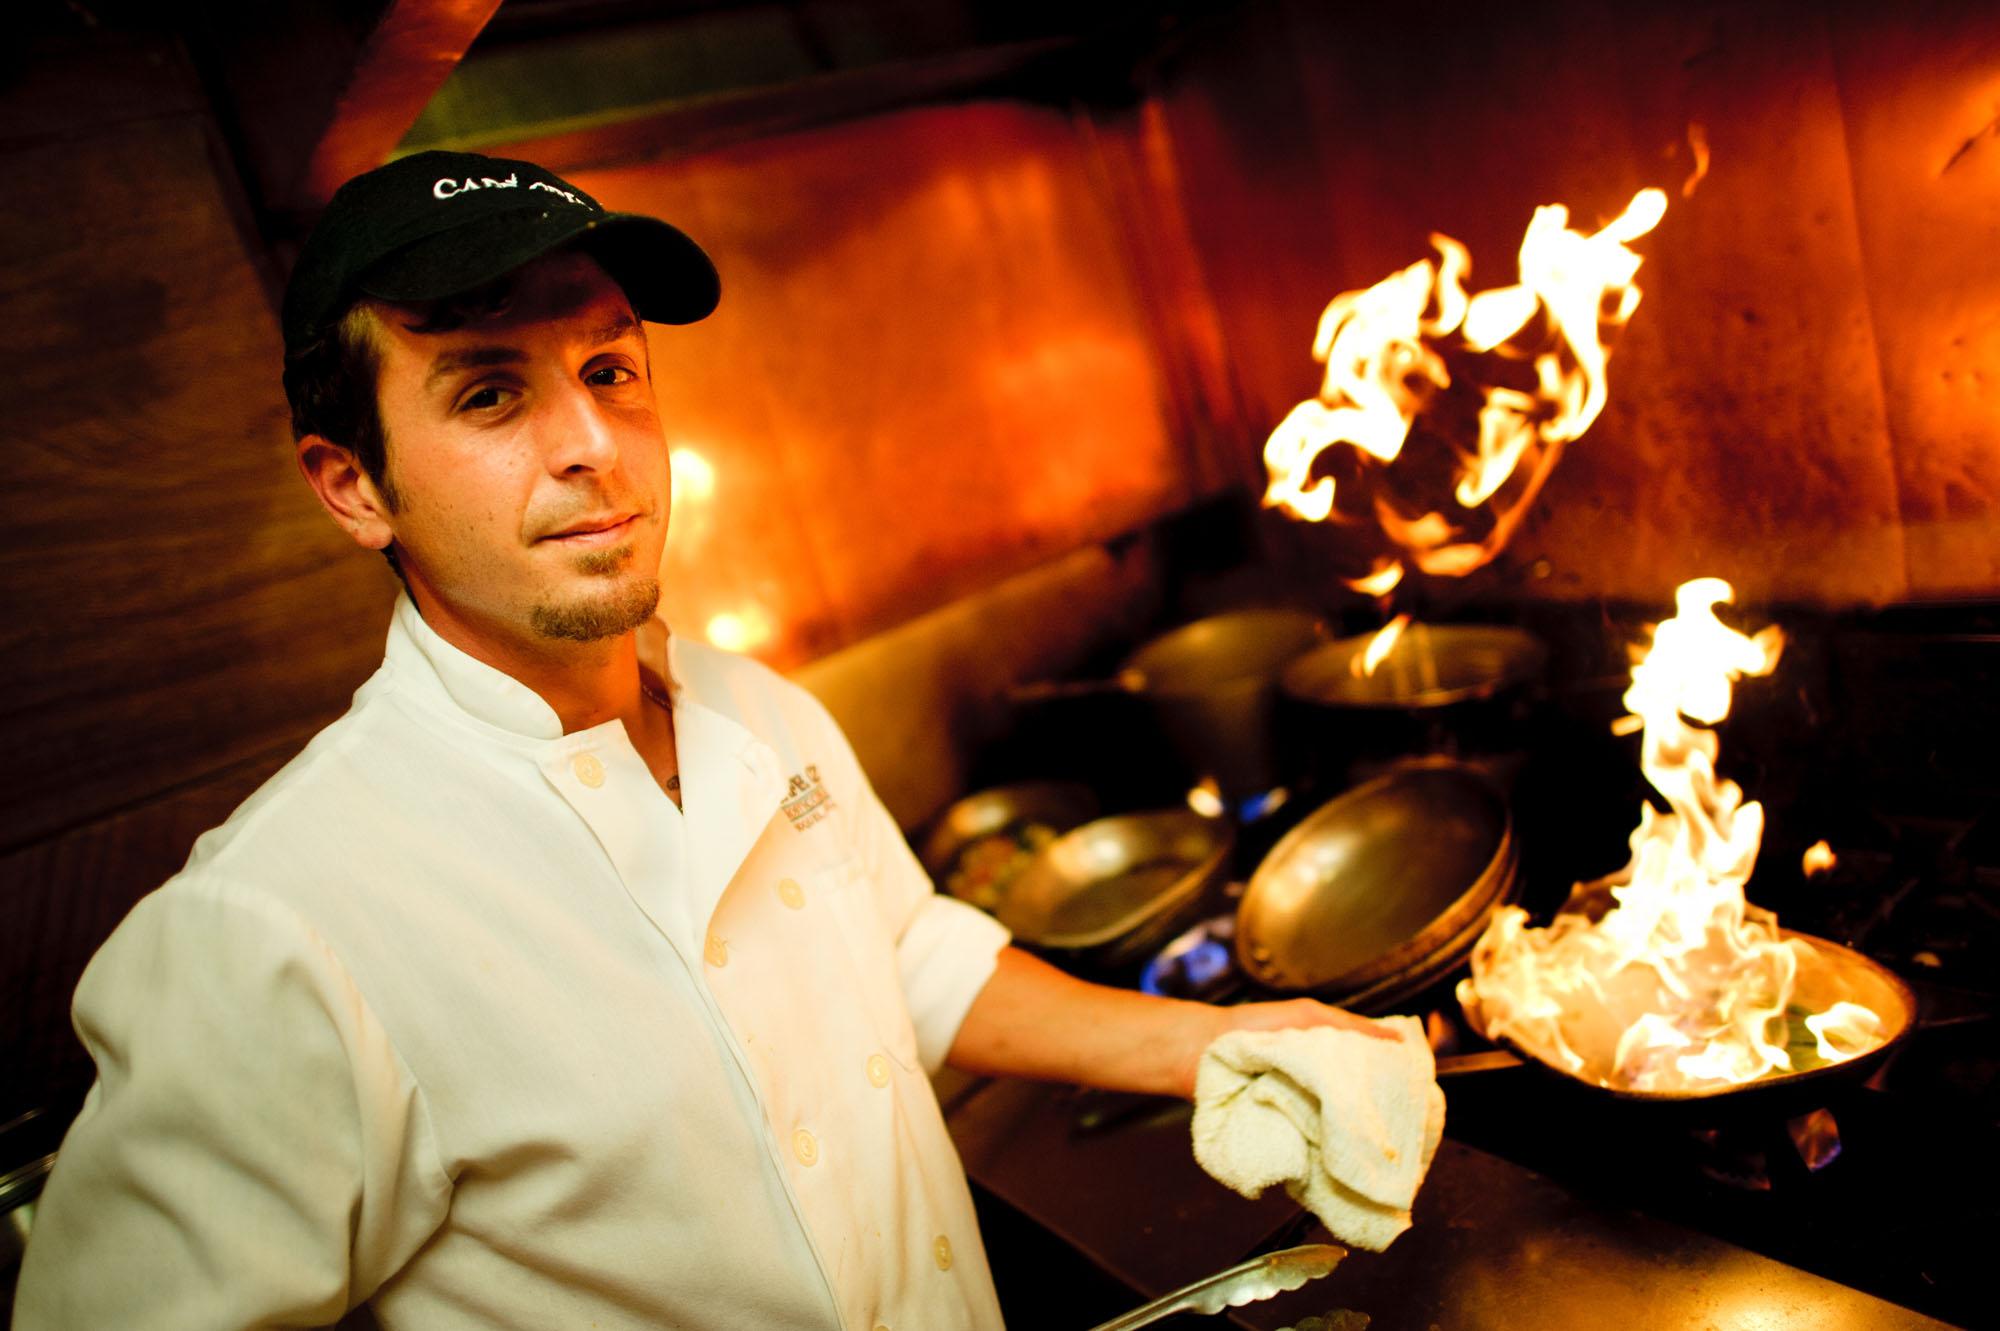 9938-d700_Cafe_Cruz_Soquel_Restaurant_Photography.jpg